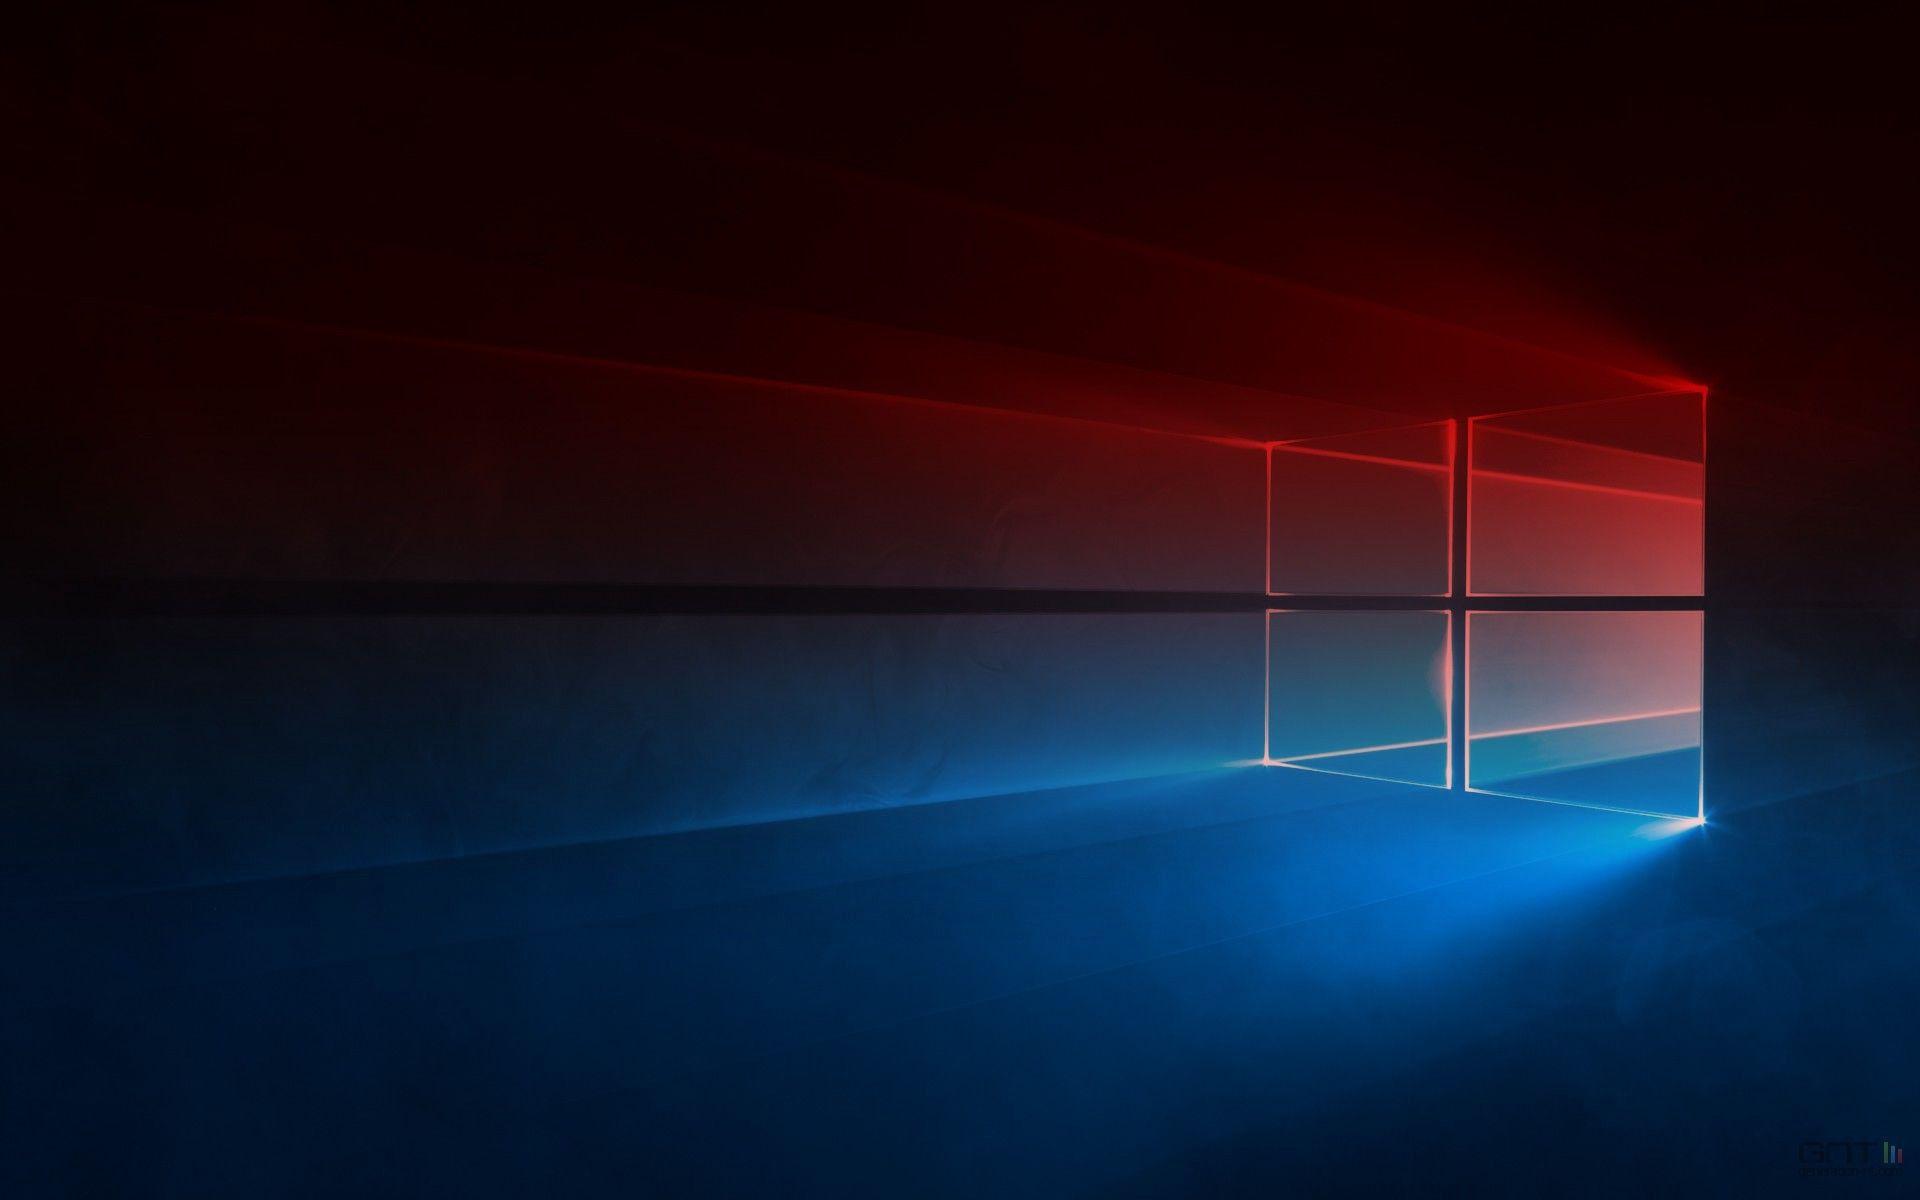 Unique Windows 10 Wallpaper 1920x1200 Windows 10 Windows Papel De Parede Do Windows